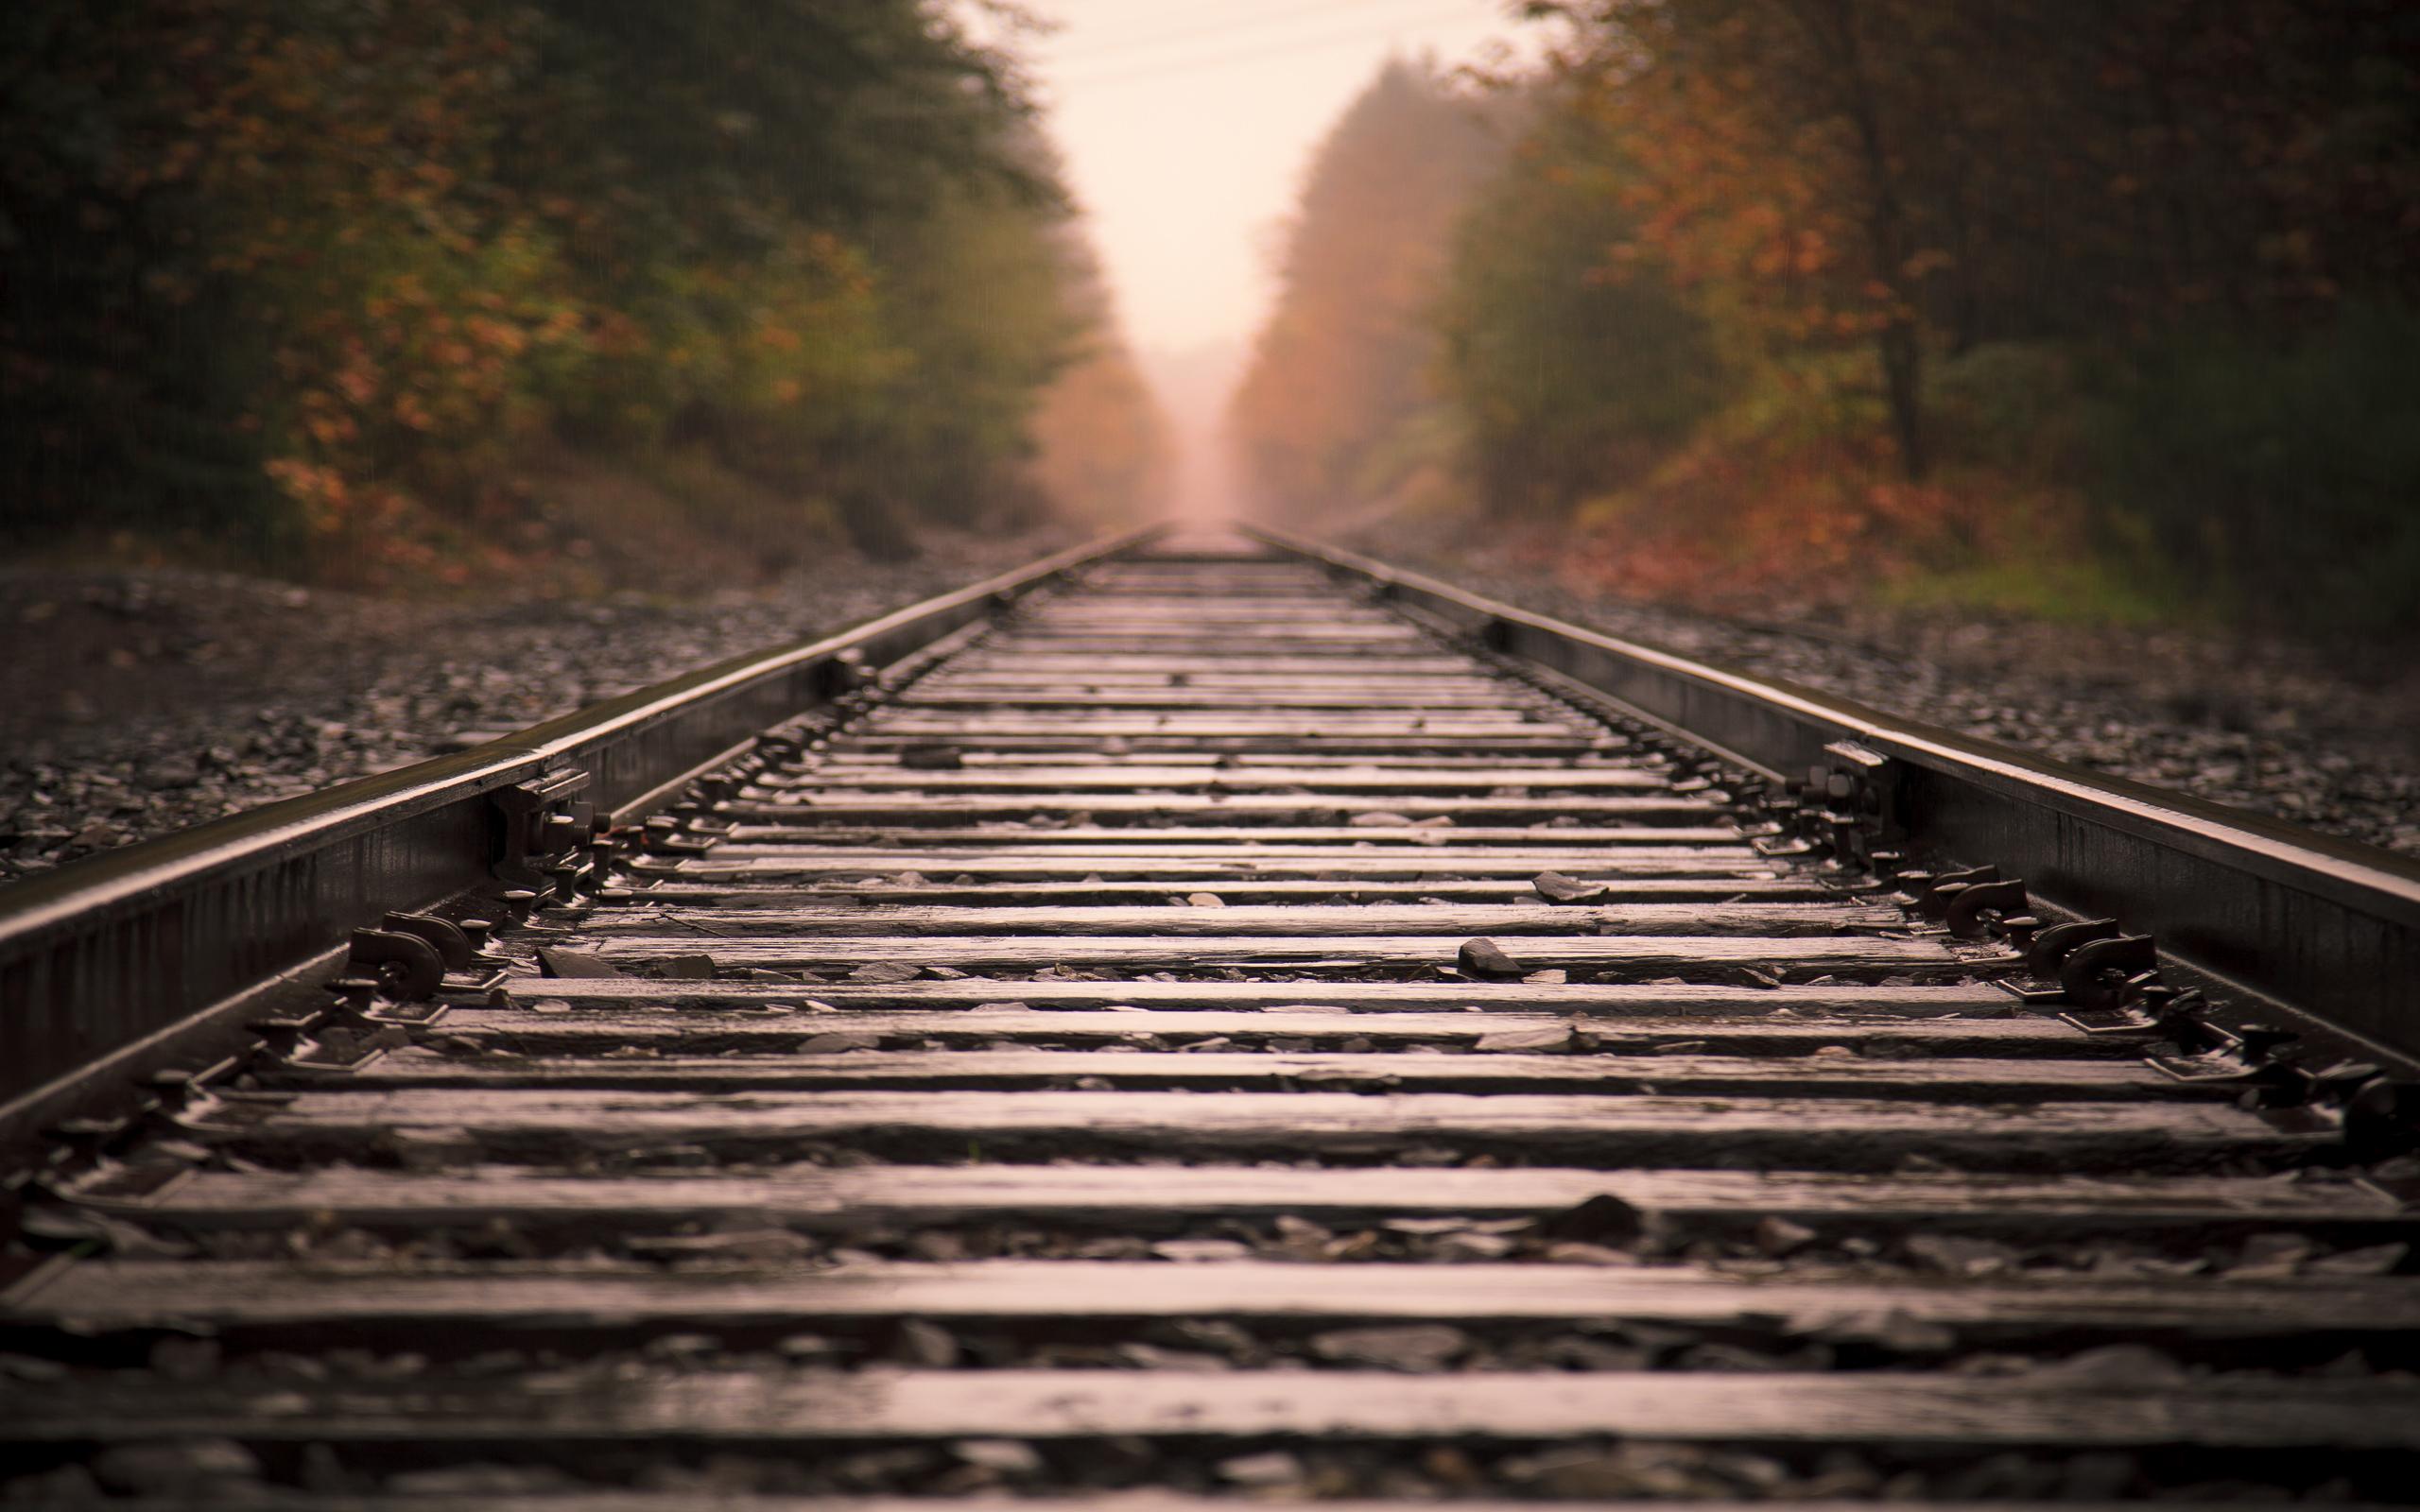 Railroad HD Wallpaper | Background Image | 2560x1600 | ID:105635 - Wallpaper Abyss